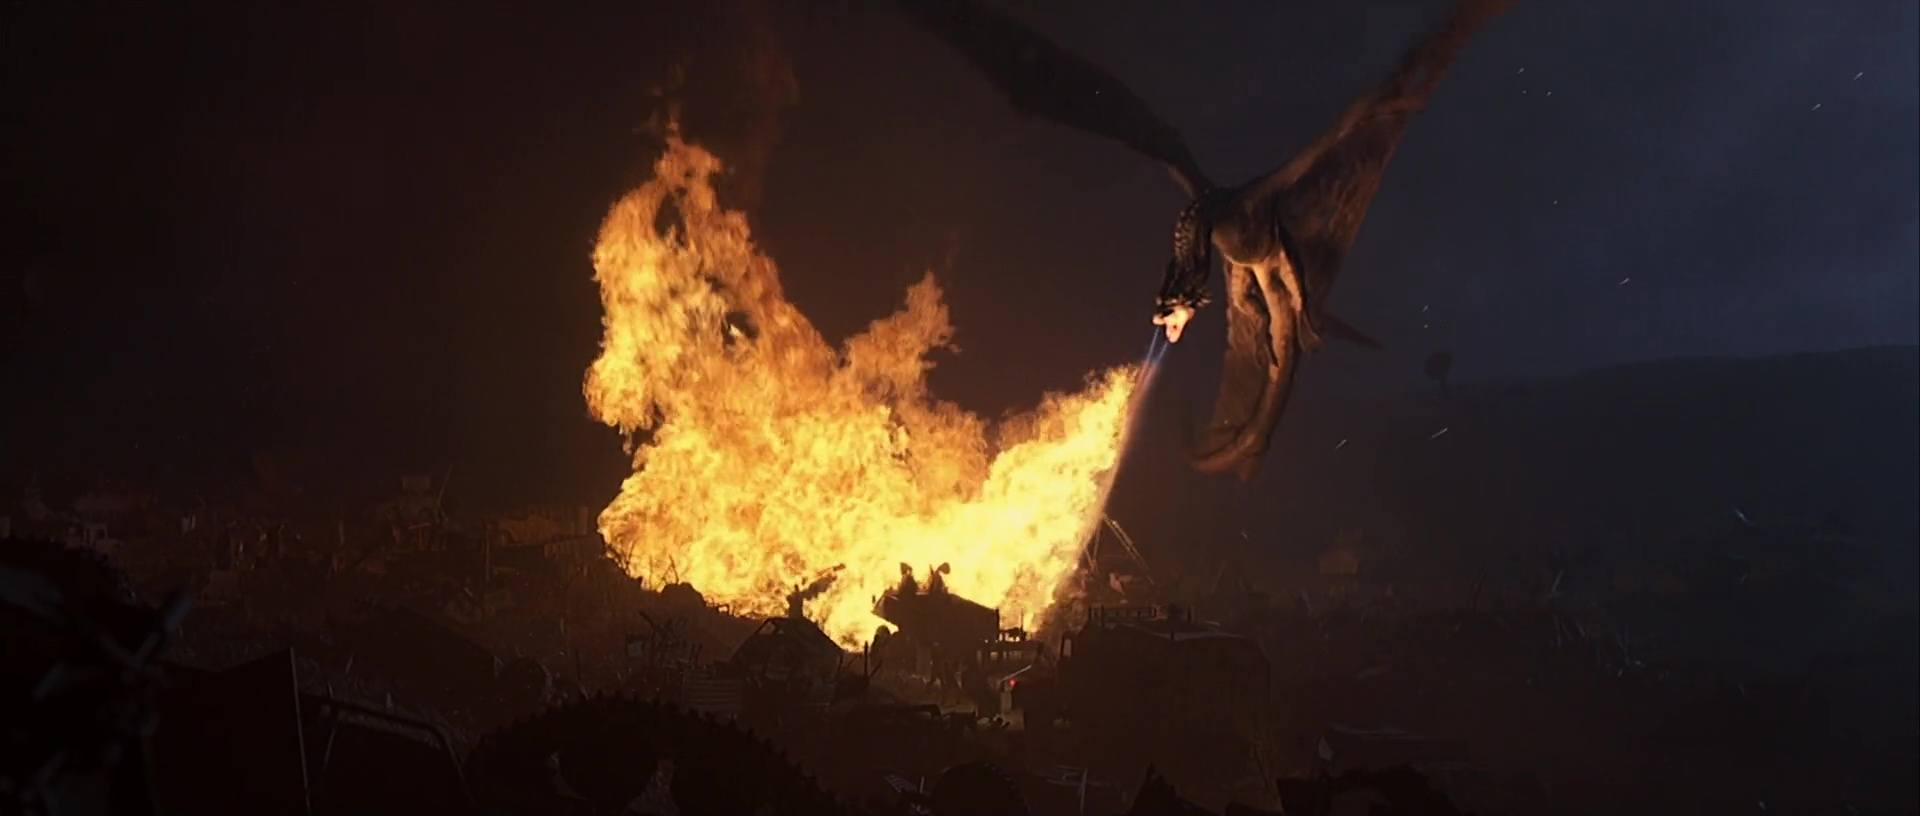 Image règne feu reign fire disney touchstone